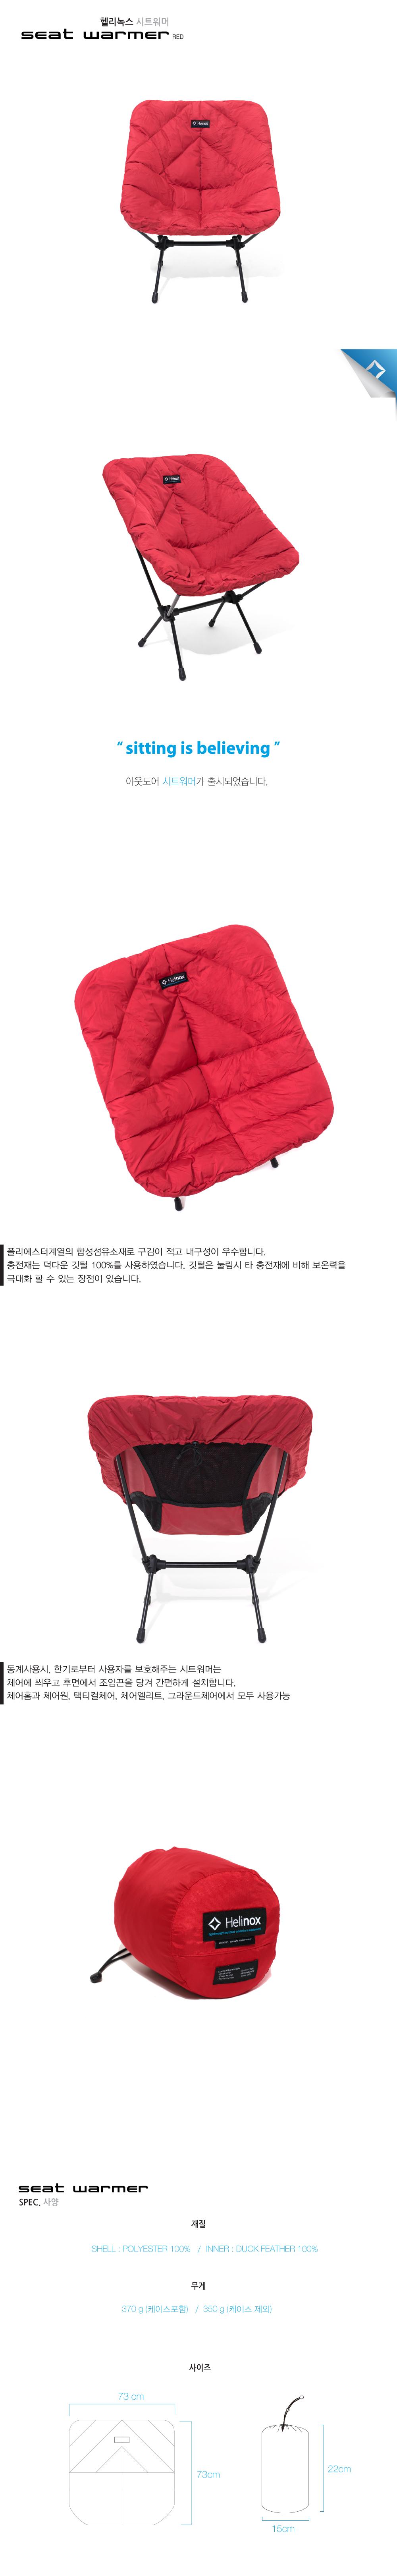 20151207-seatwarmer_red상품페이지.jpg